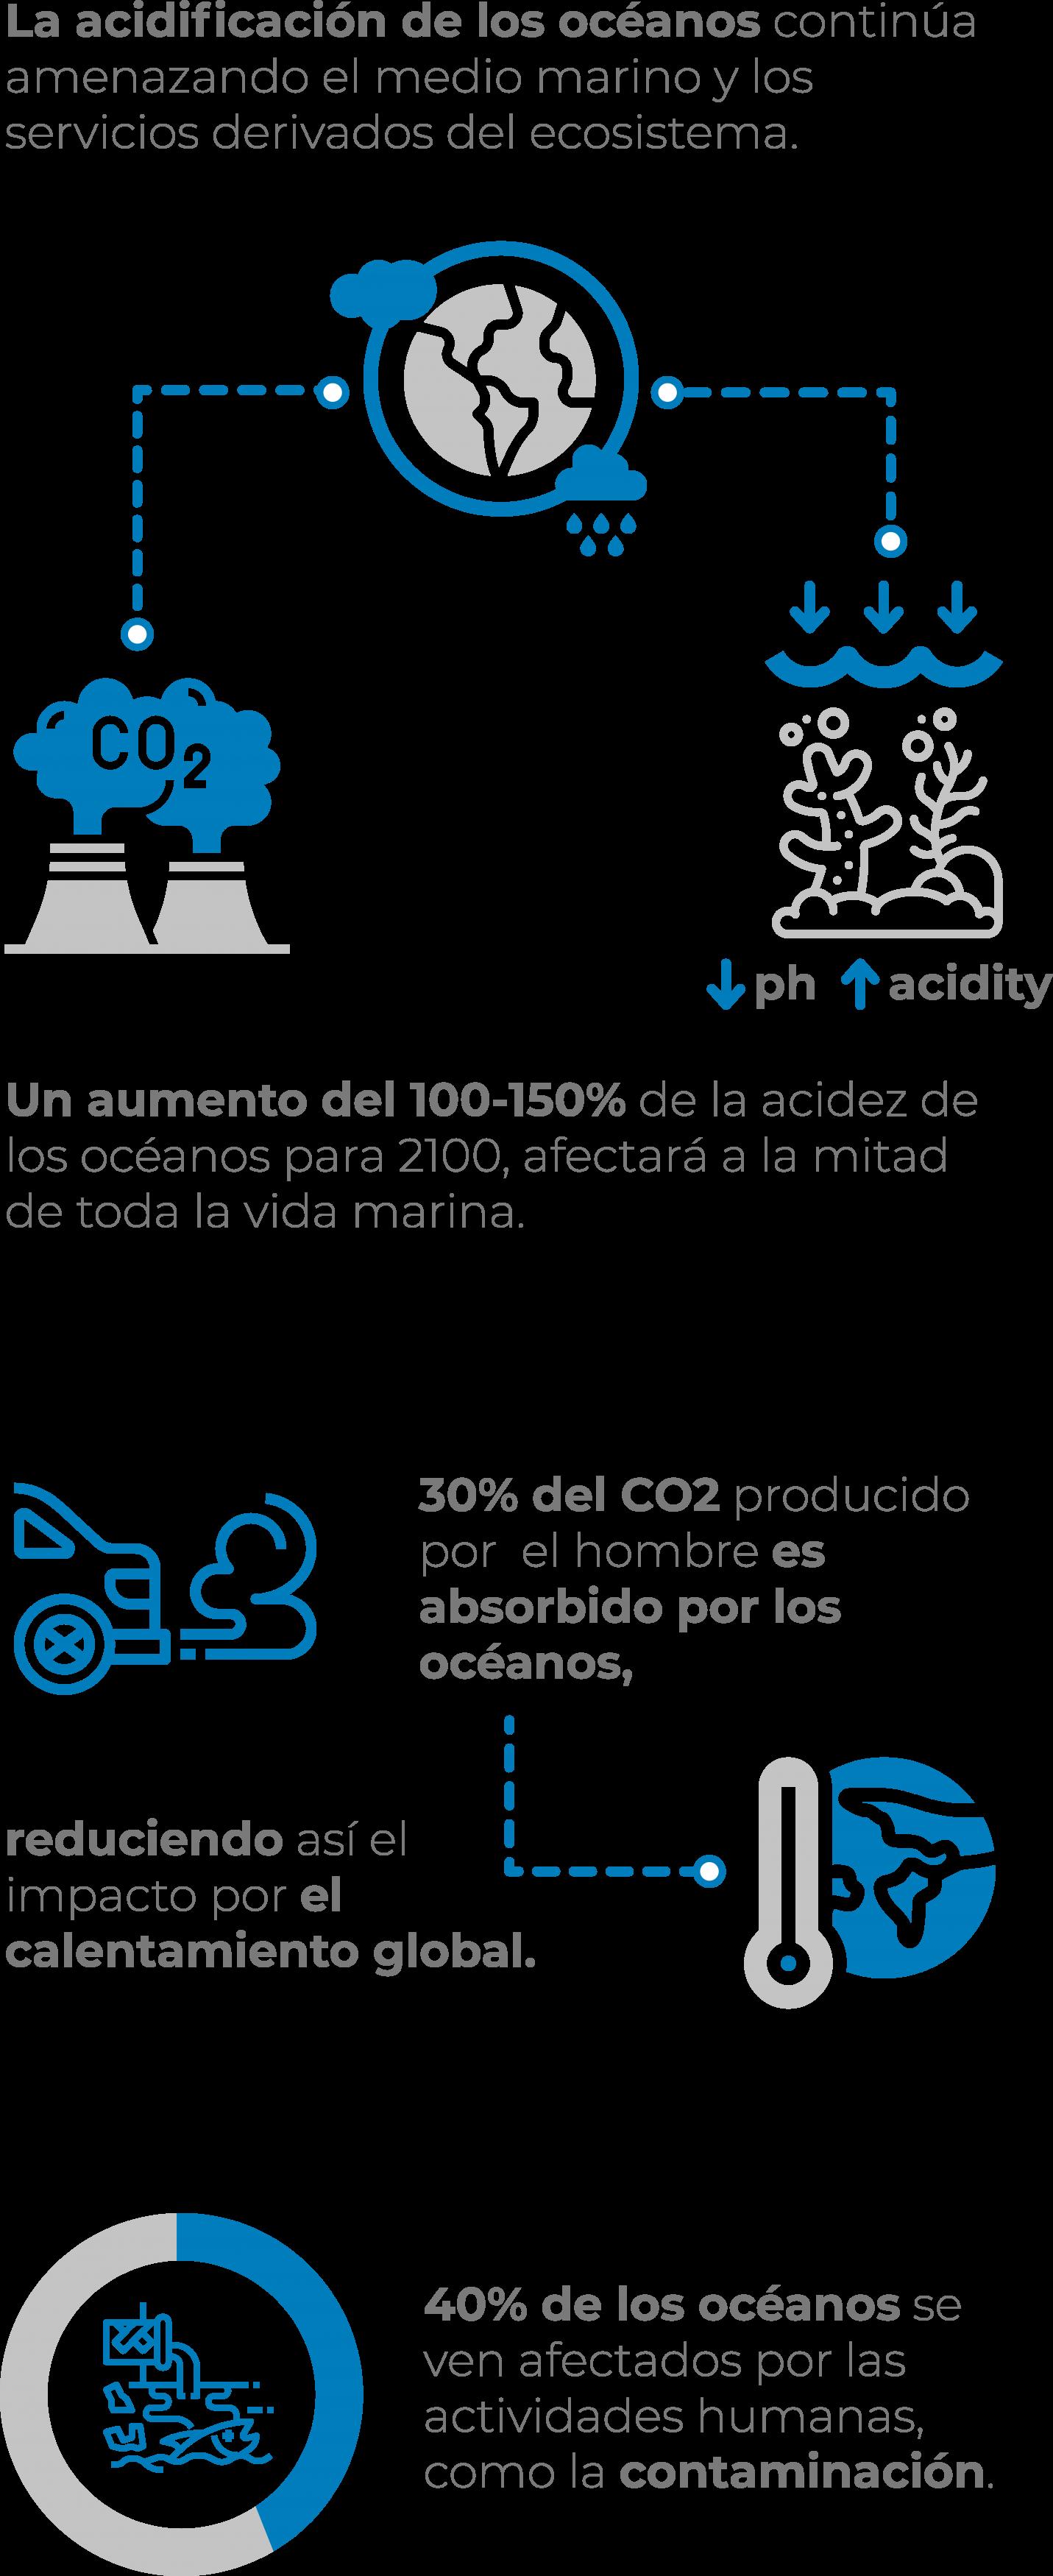 ODS 14. Vida submarina